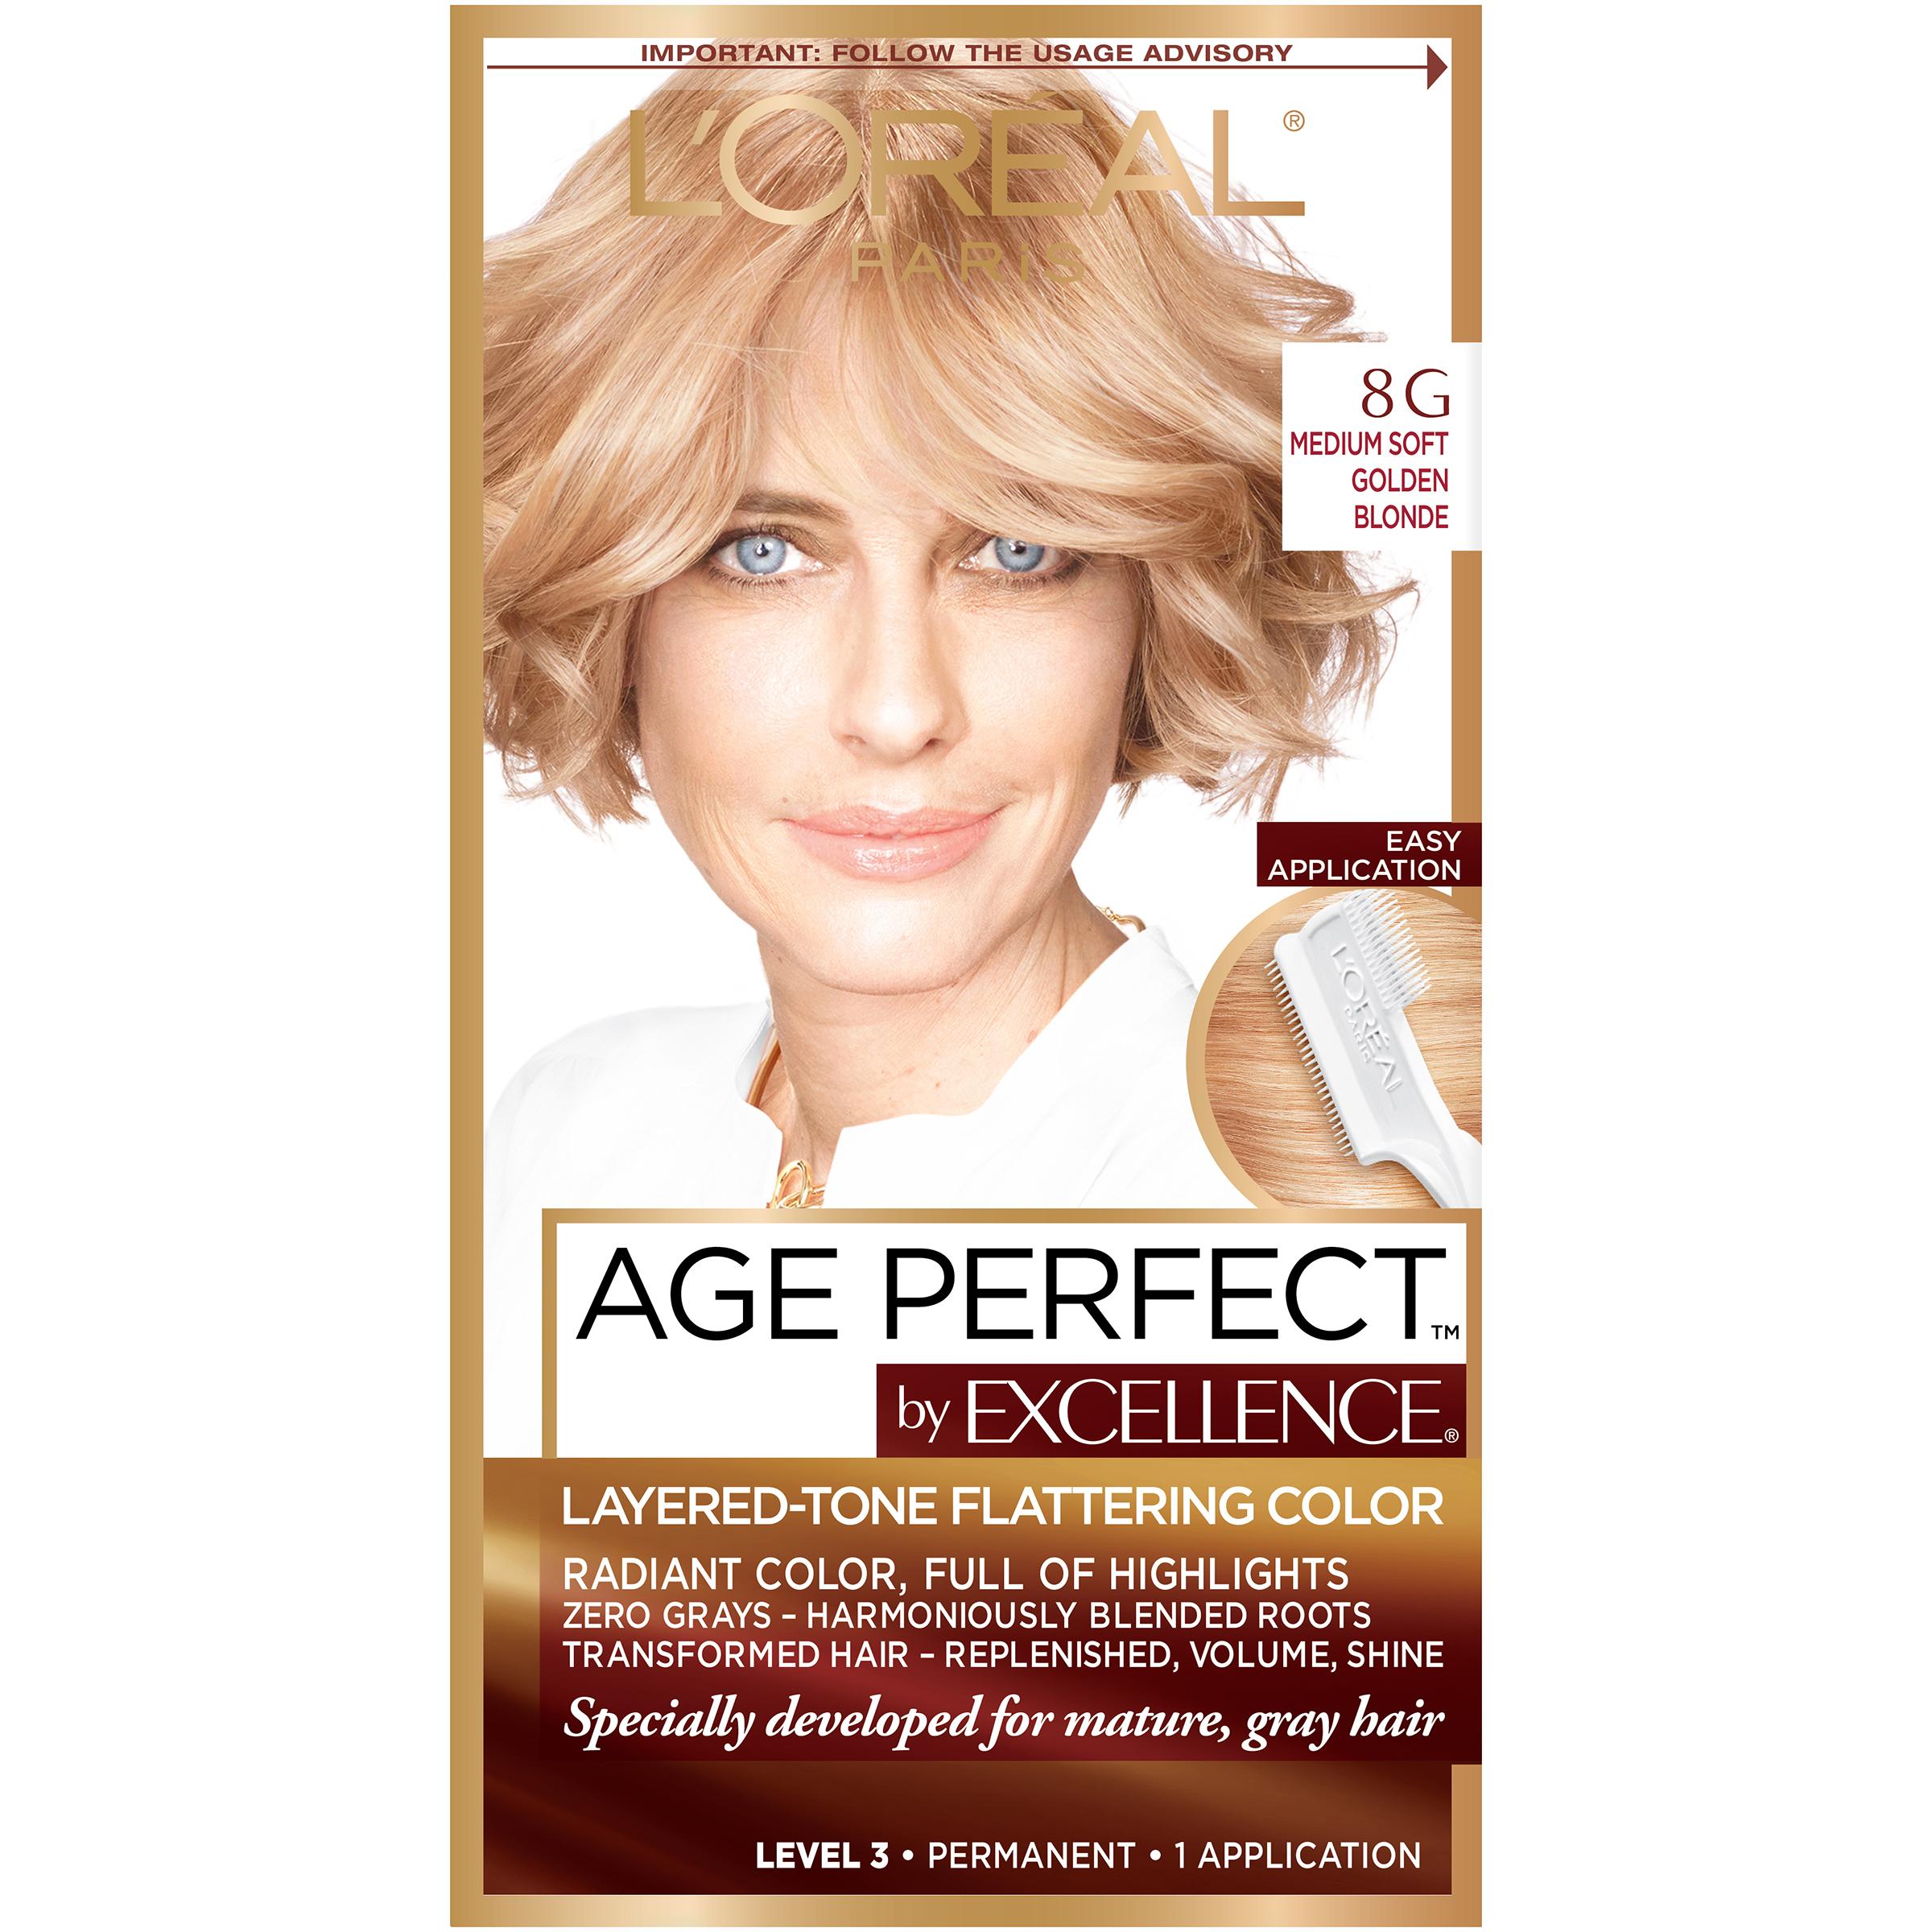 LOreal-Paris-Age-Perfect-Permanent-Hair-Color